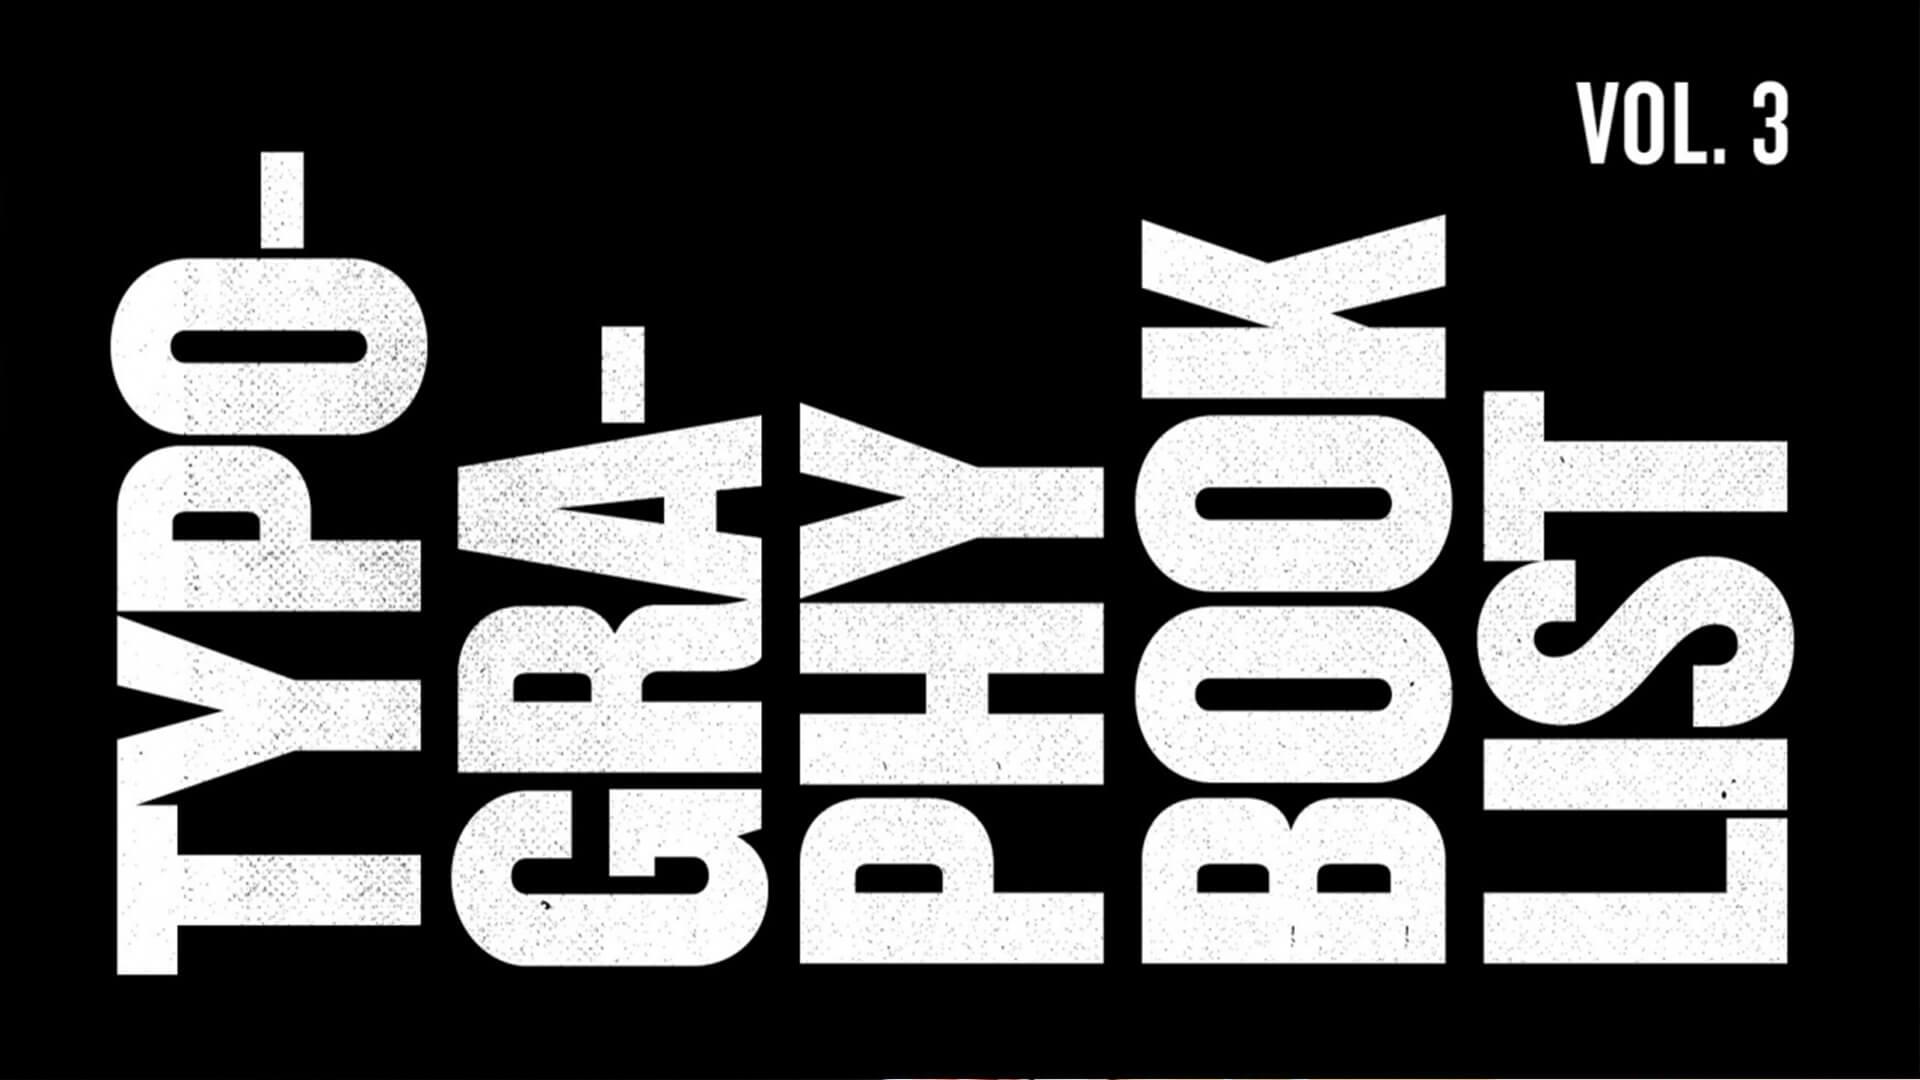 Essential Design Books Vol. 3: Typography